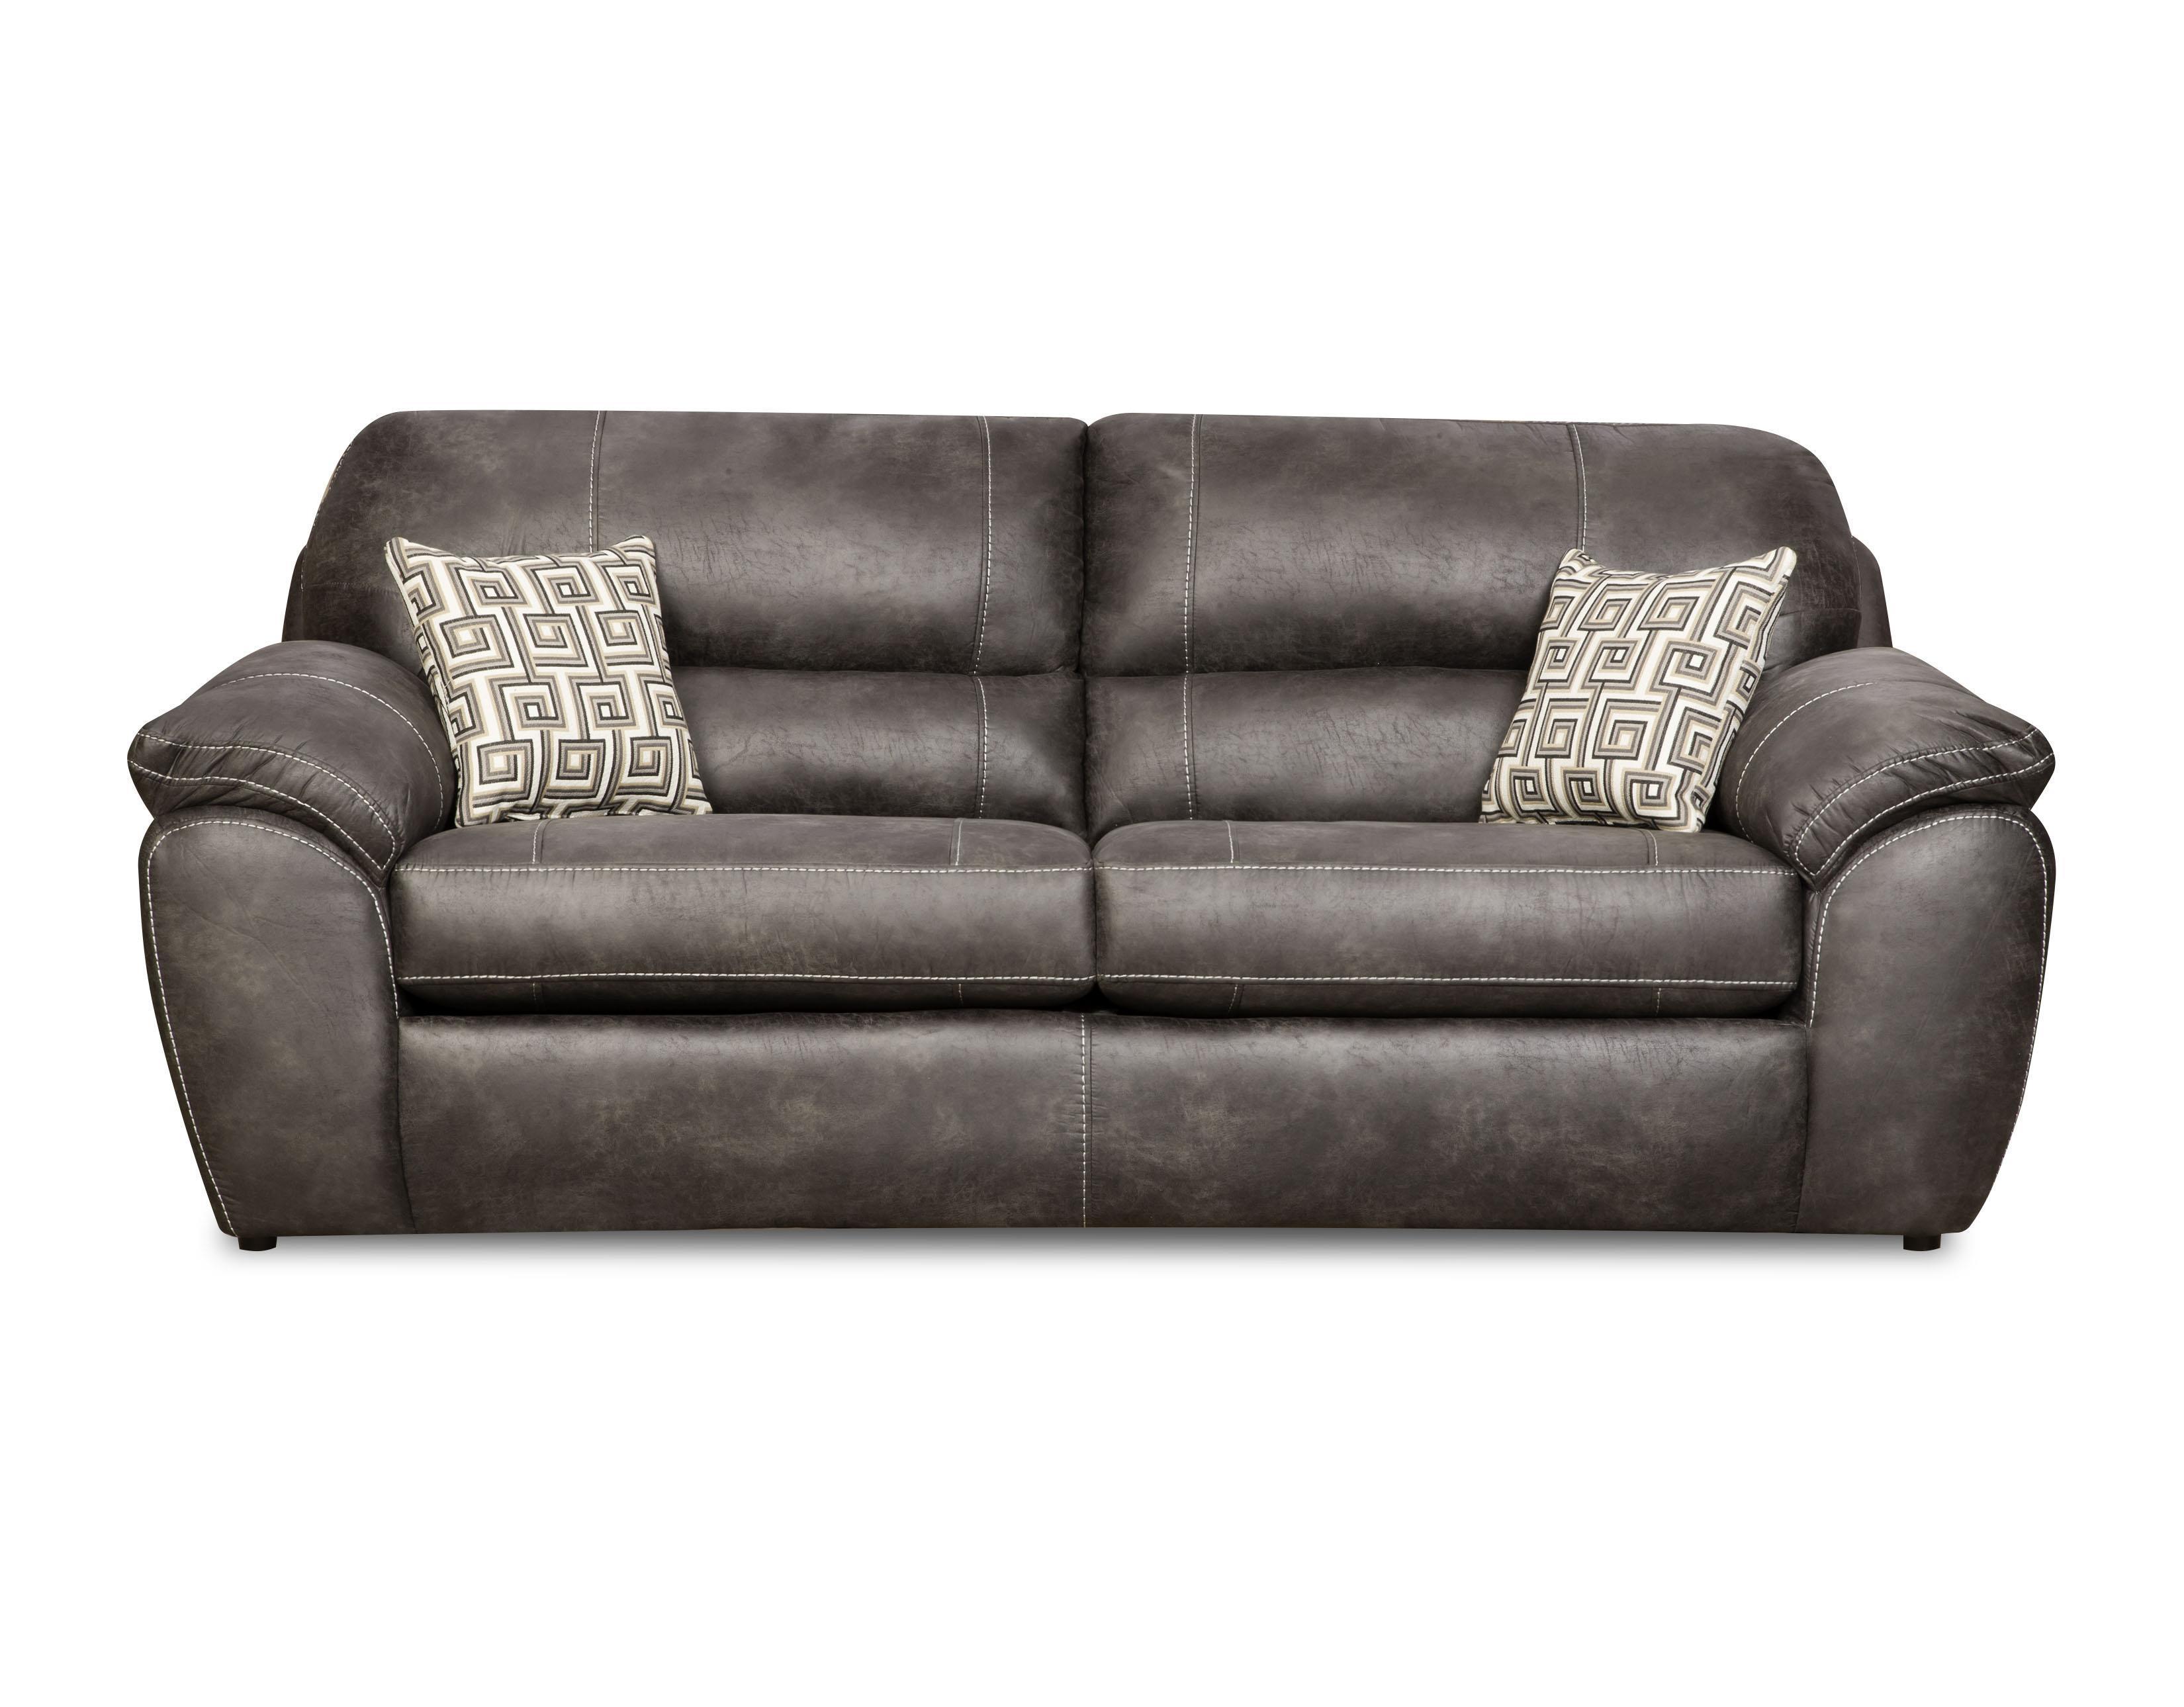 Corinthian Ulysses Charcoal Ulysses Charcoal Queen Sofa Sleeper - Item Number: 18B4